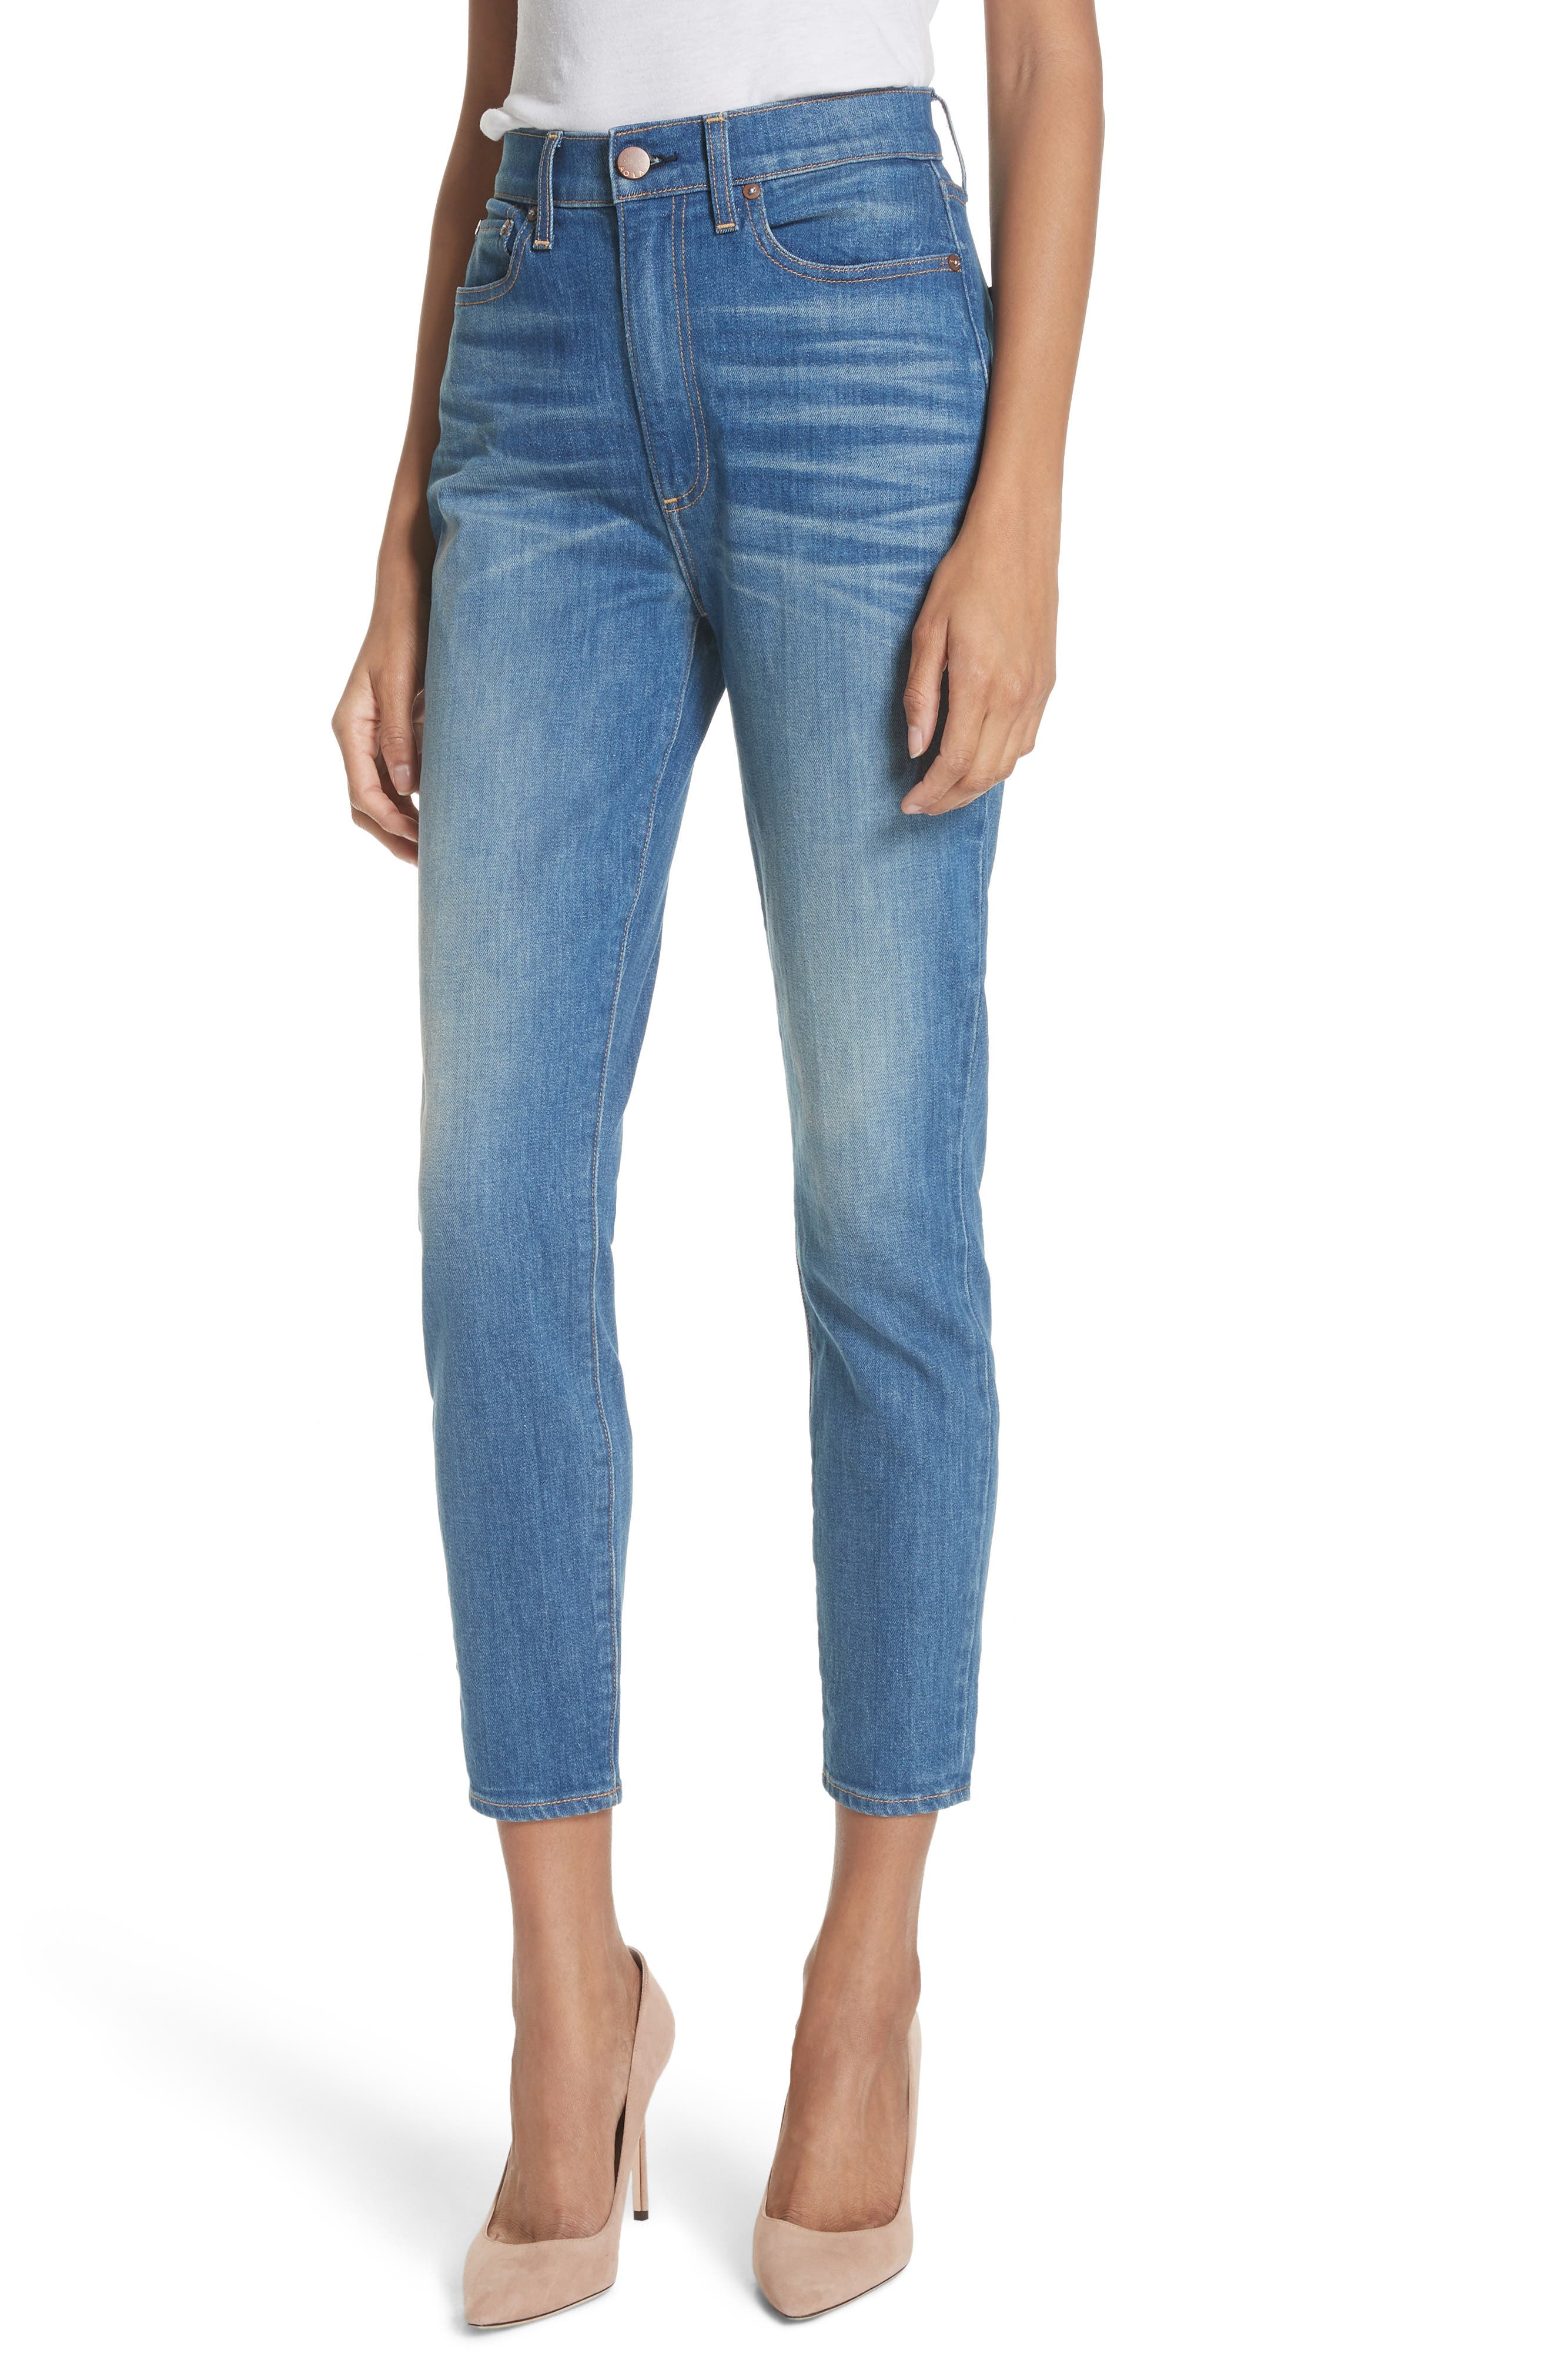 AO.LA Good High Waist Ankle Skinny Jeans,                             Main thumbnail 1, color,                             Side Hustle